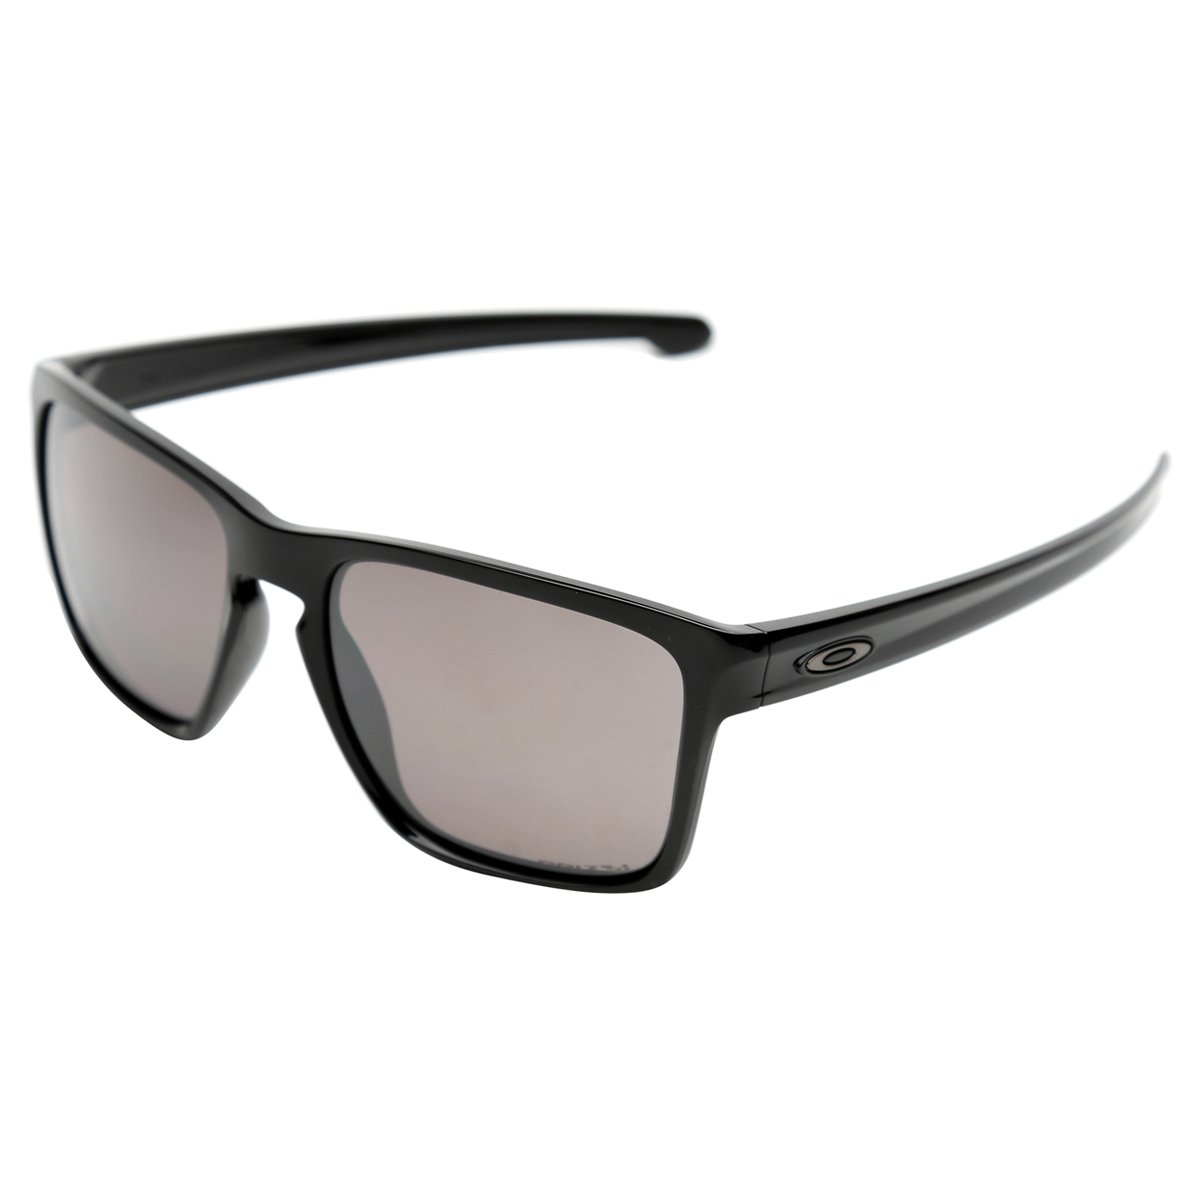 Óculos Oakley Sliver Xl-Prizm Daily Polarized - Compre Agora   Netshoes 71576312b6